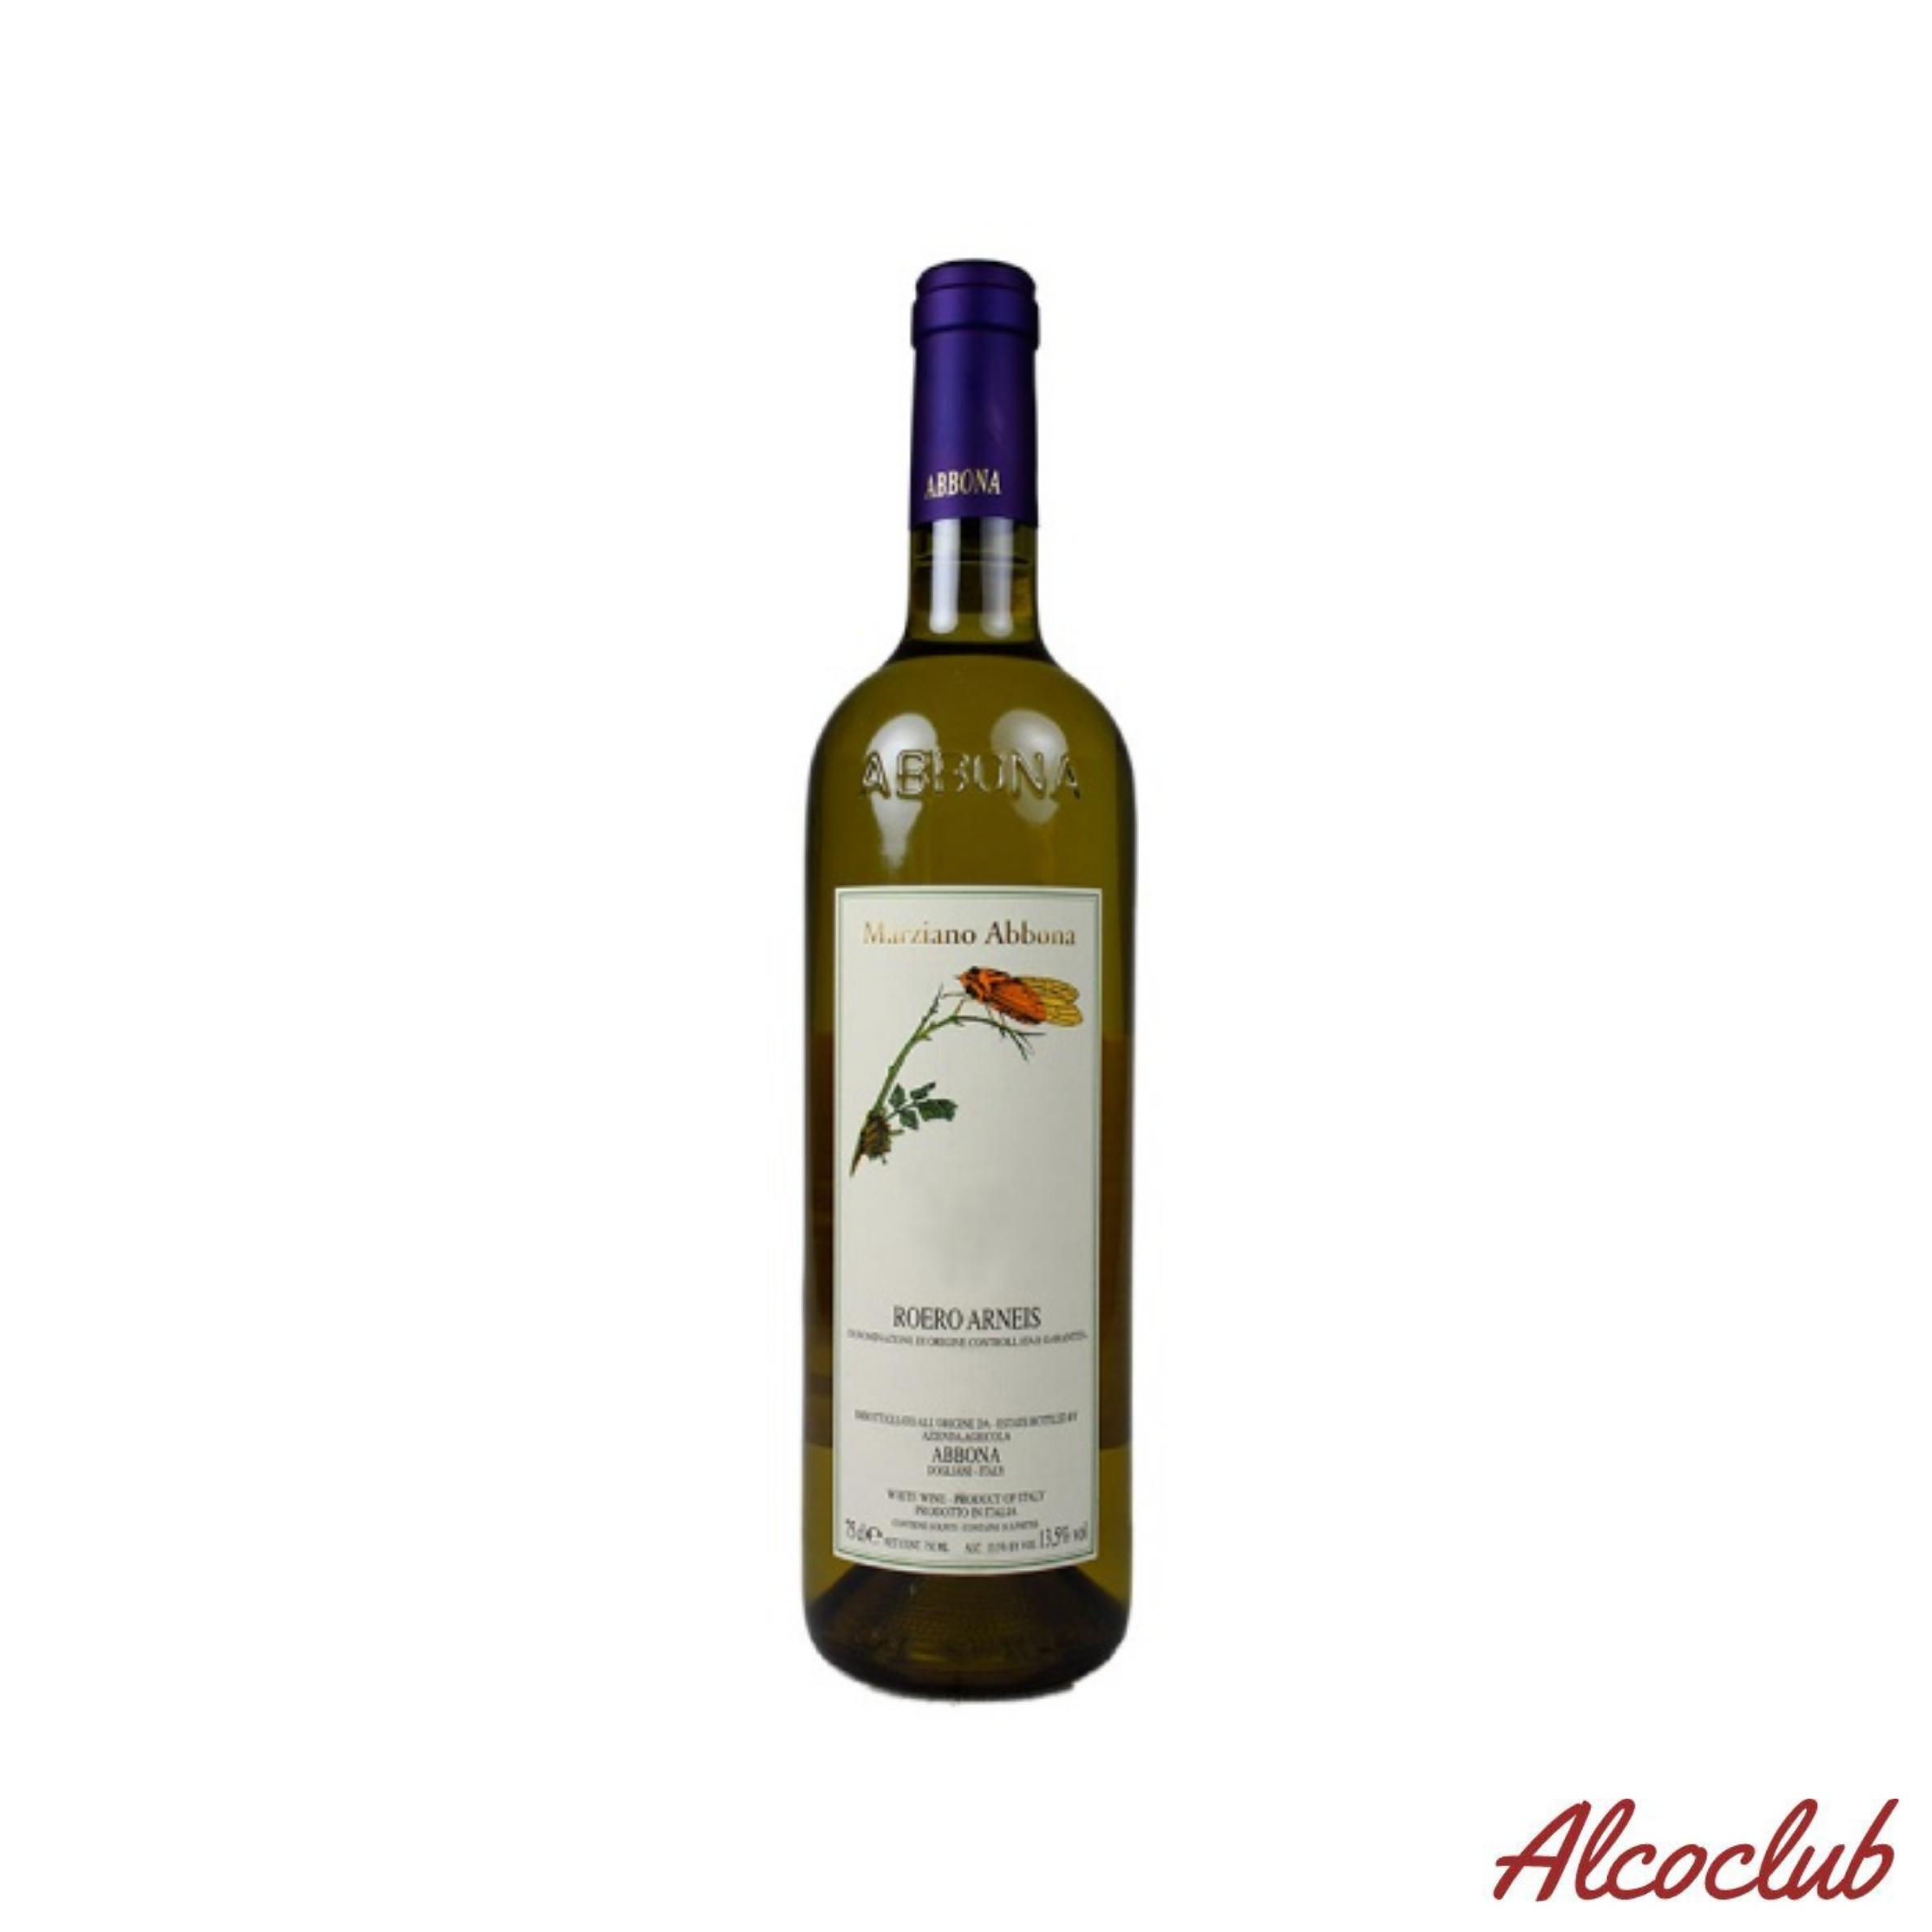 Купить в Украине вино Abbona Roero Arneis Langhe DOCG Tistin Италия